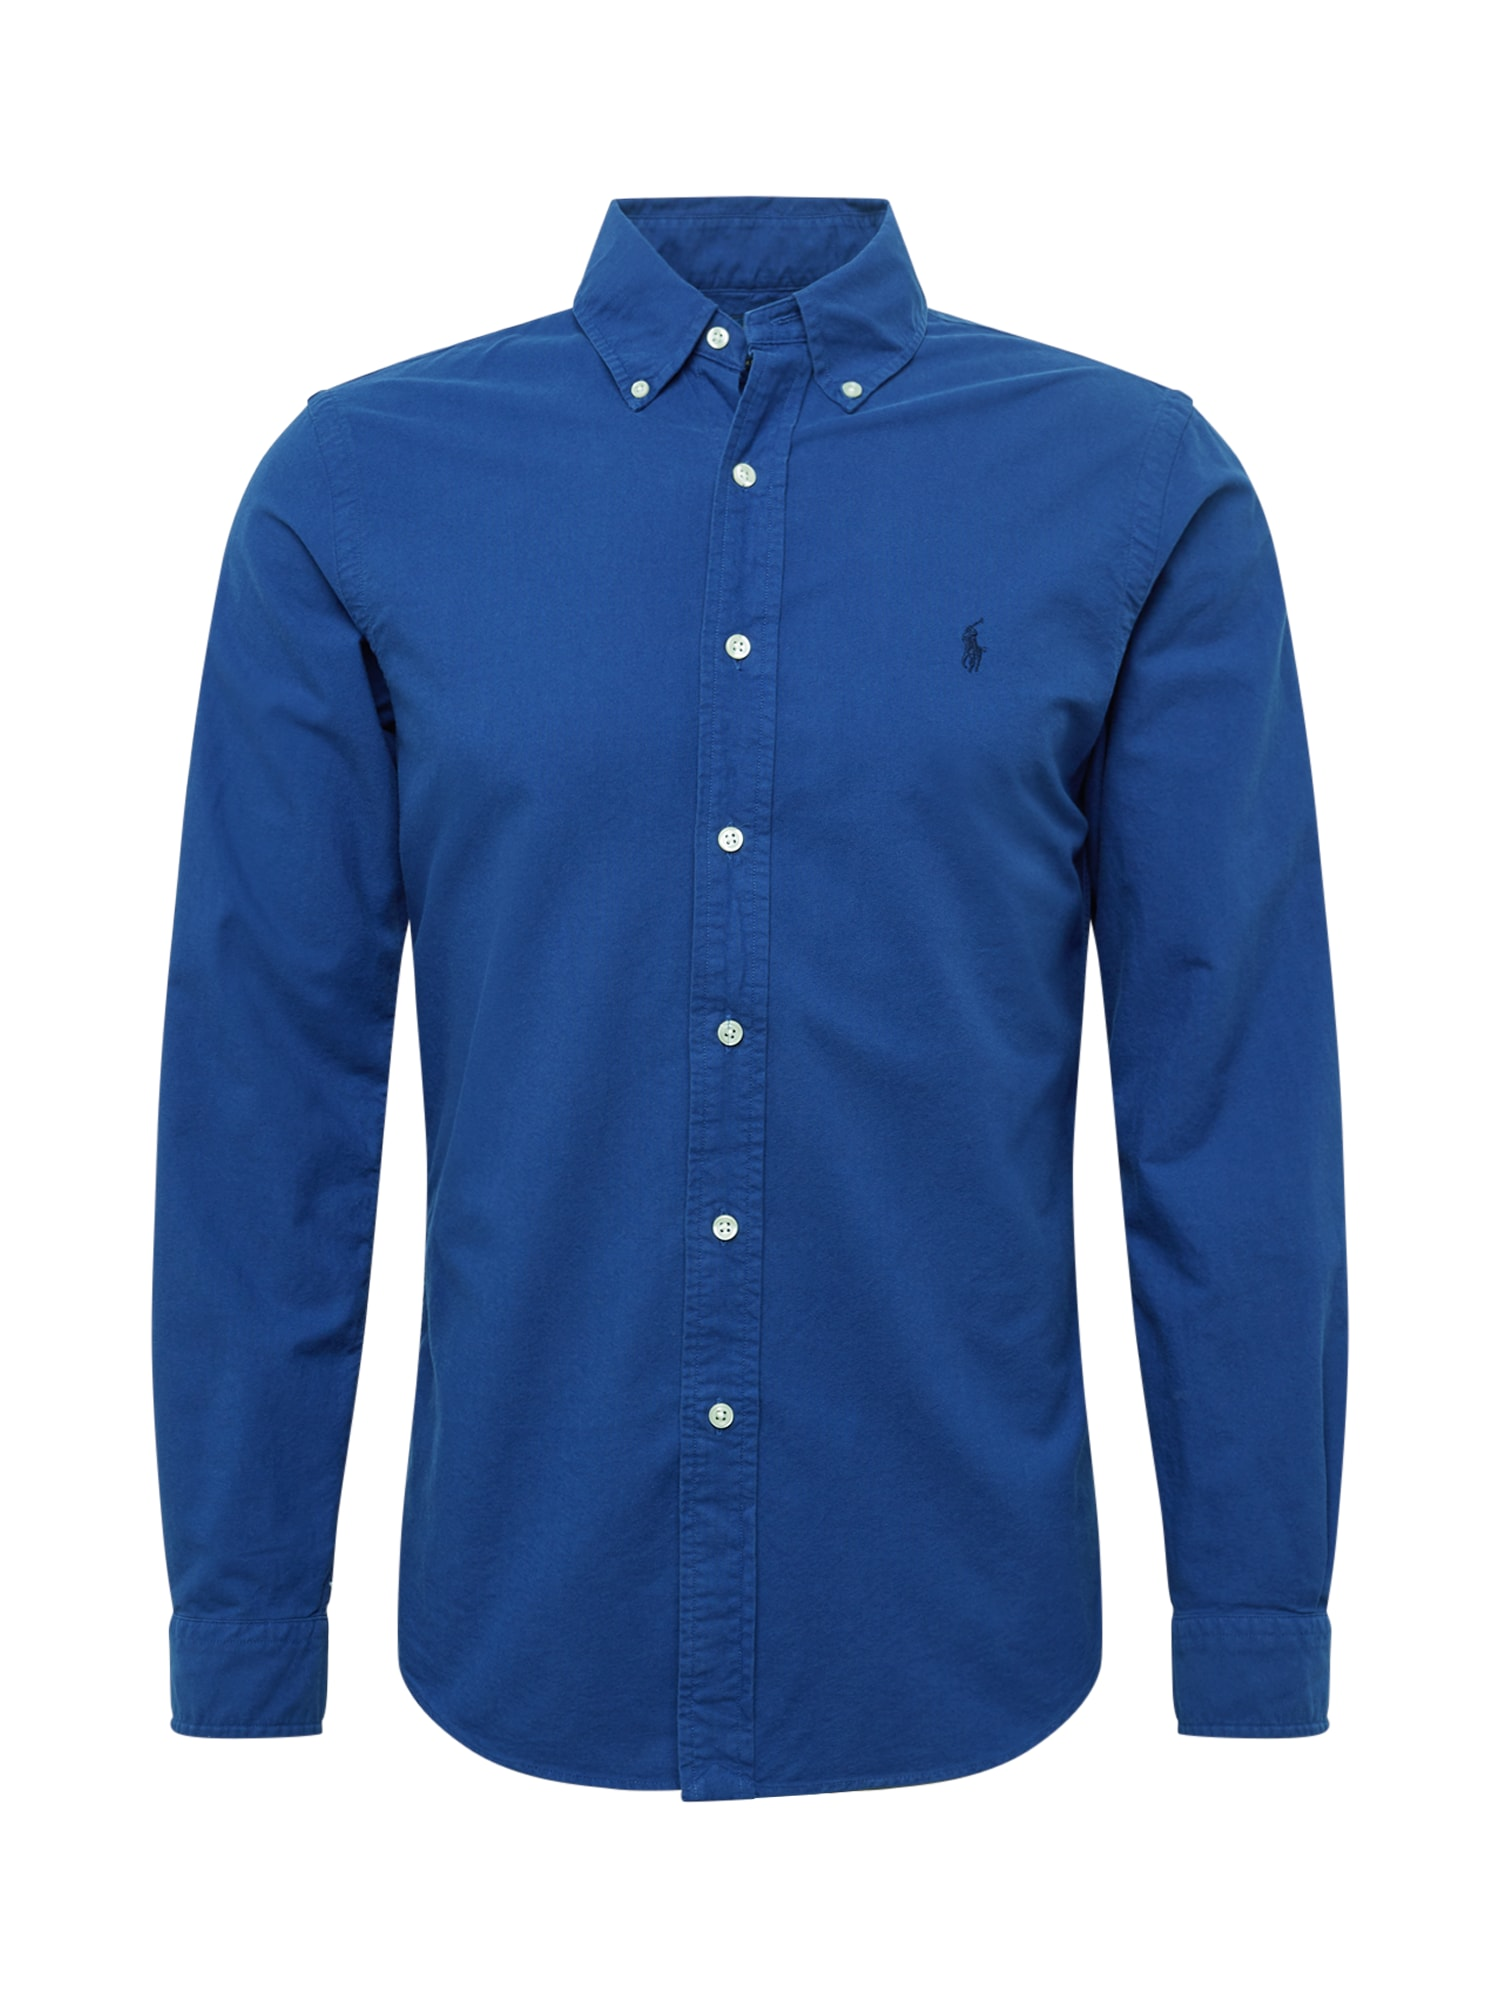 Košile GD OXFORD-SL BD PPC SPT tmavě modrá POLO RALPH LAUREN